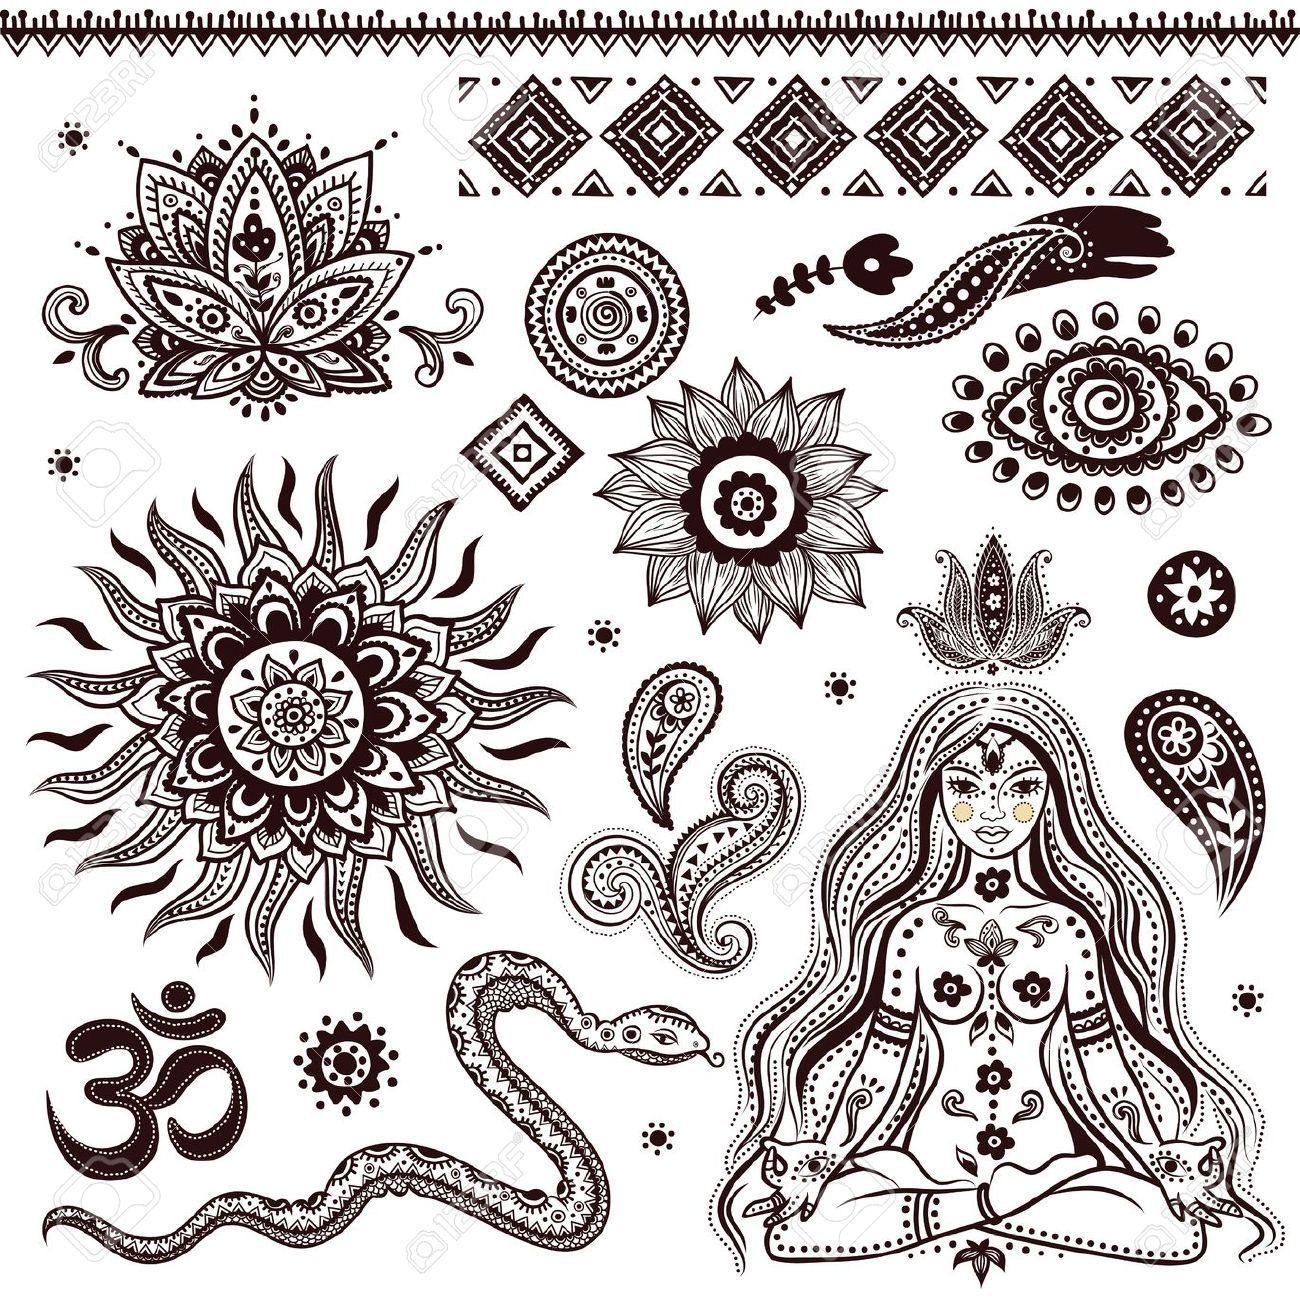 Pin by Dagmar Micikova on Mandala pattern | Indian symbols